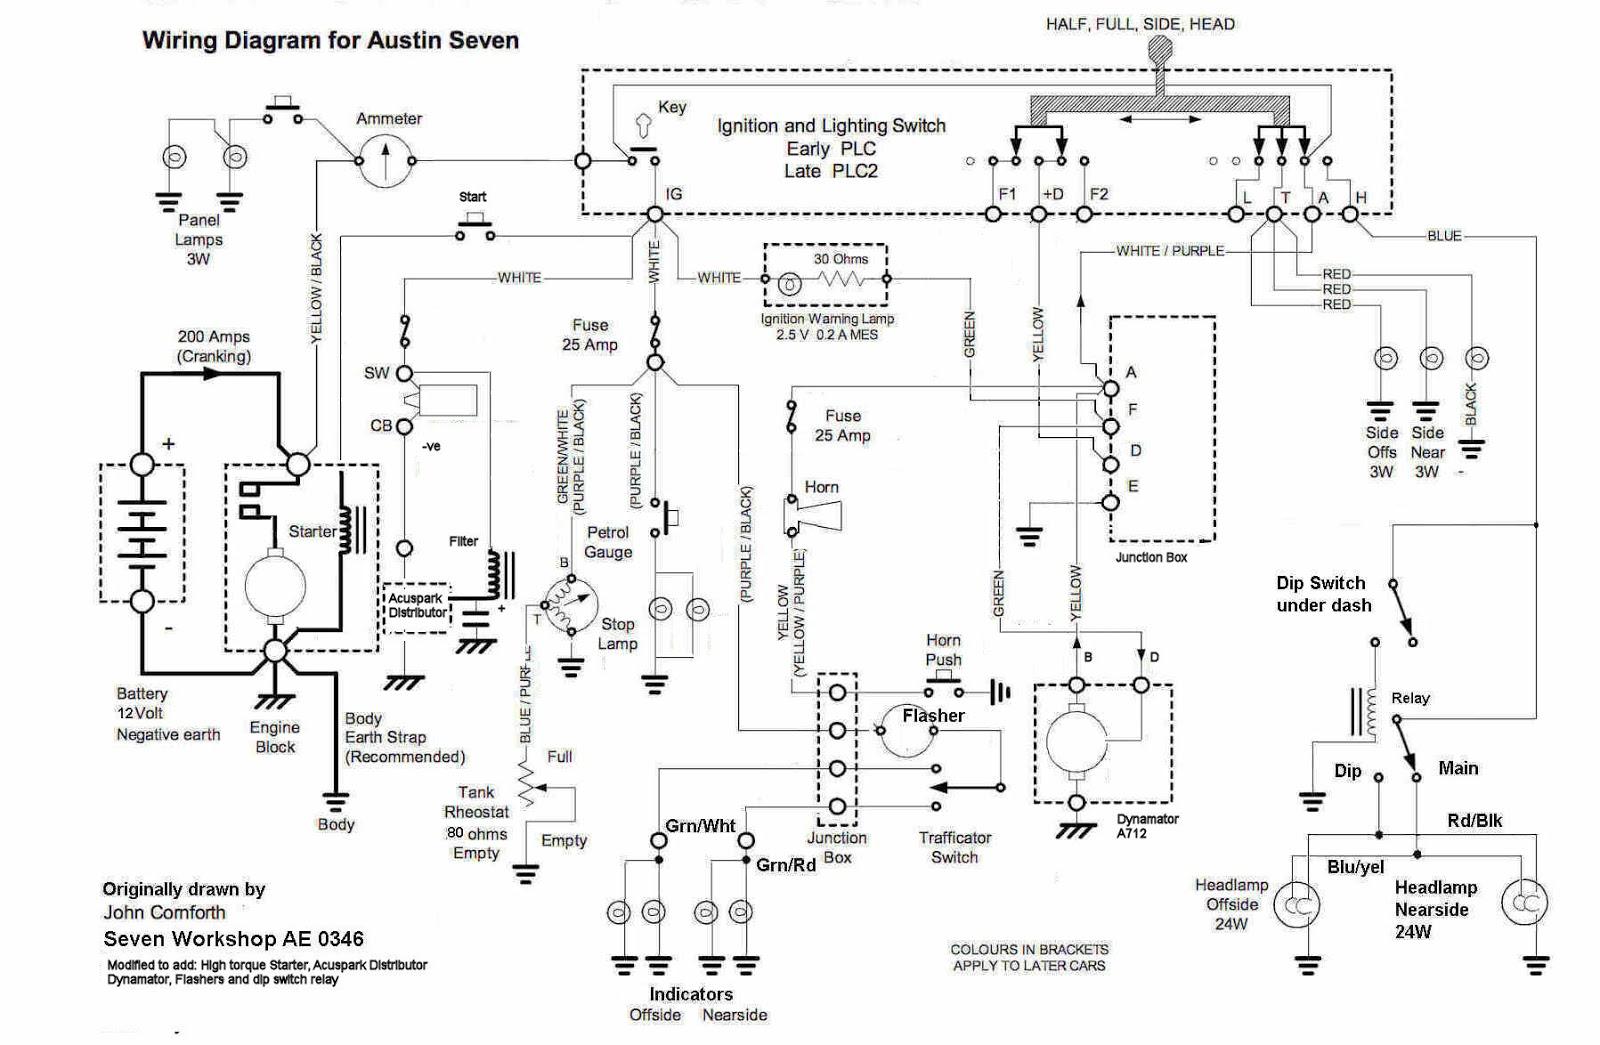 austin seven wiring diagram detailed wiring diagramaustin seven wiring  diagram wiring diagram data austin seven special